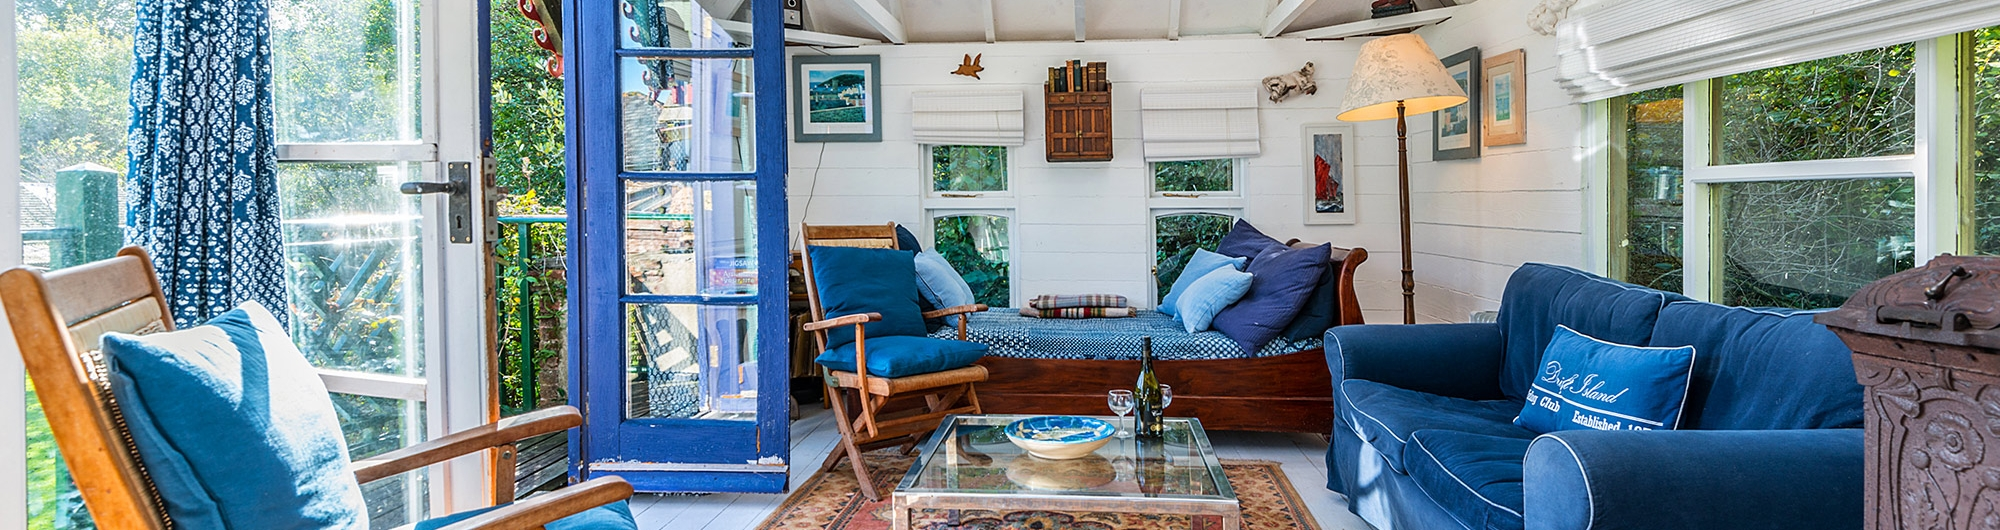 The folly living room